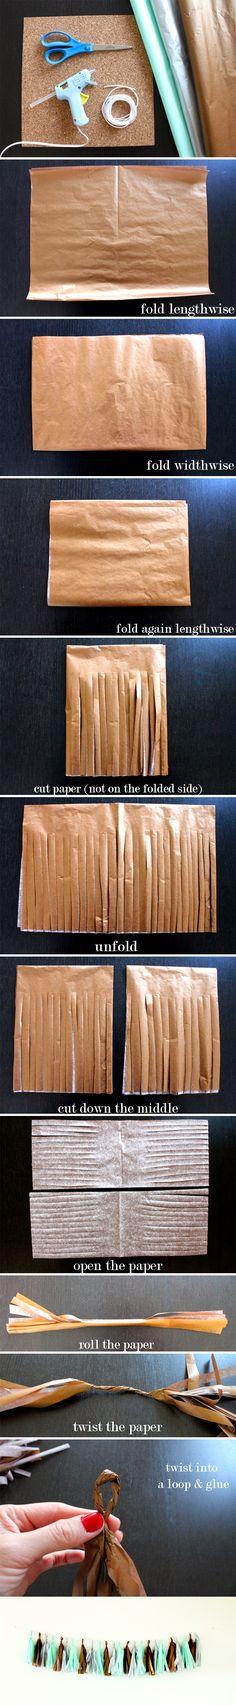 How to make a Tissue Paper Tassel Garland